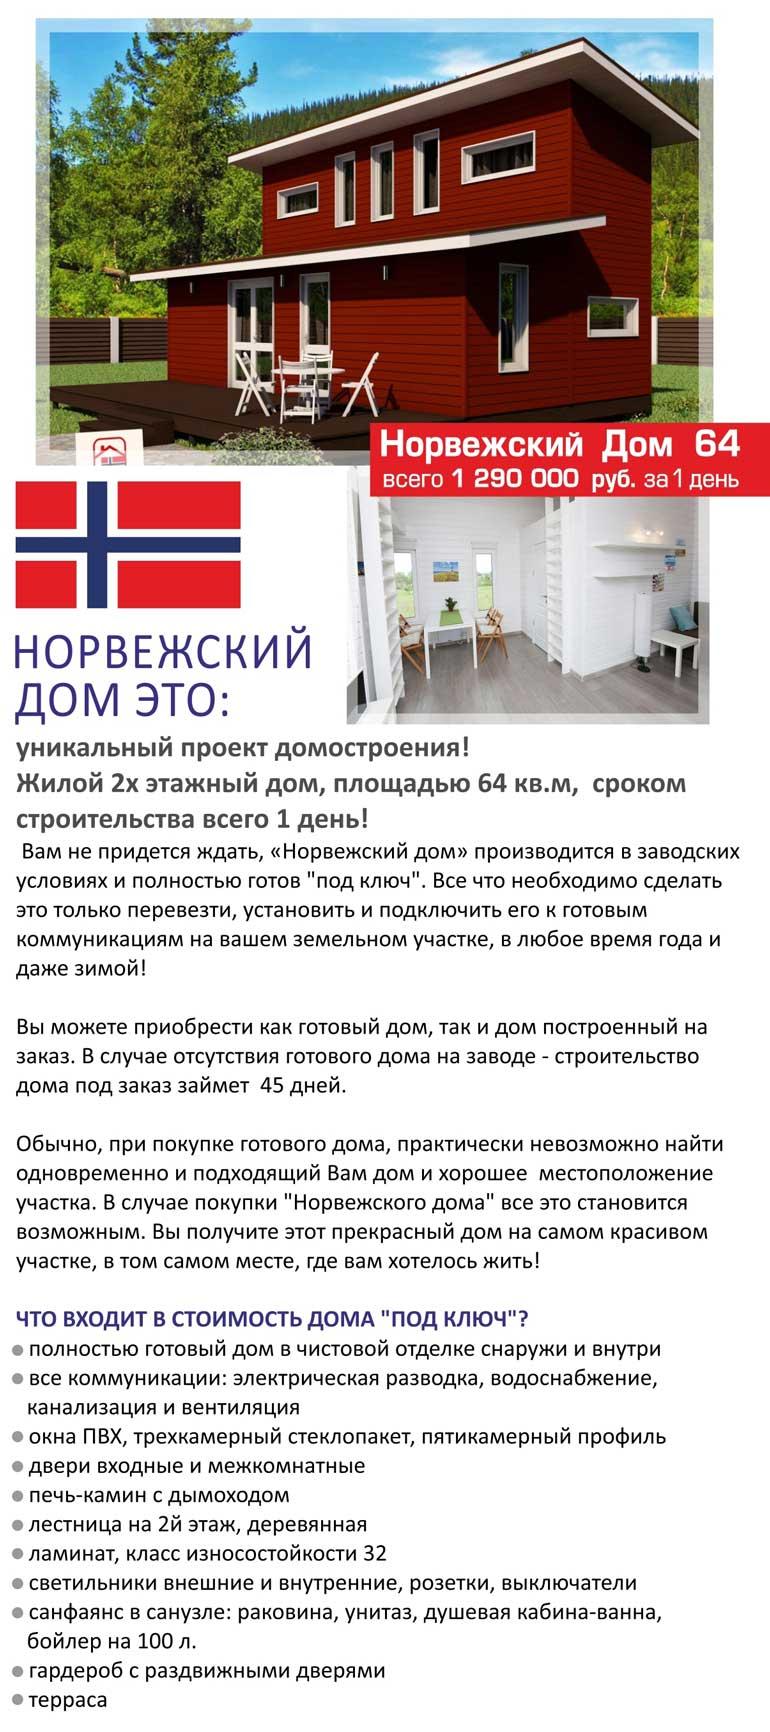 norvezhskiy-dom-64-modum-za-1-den